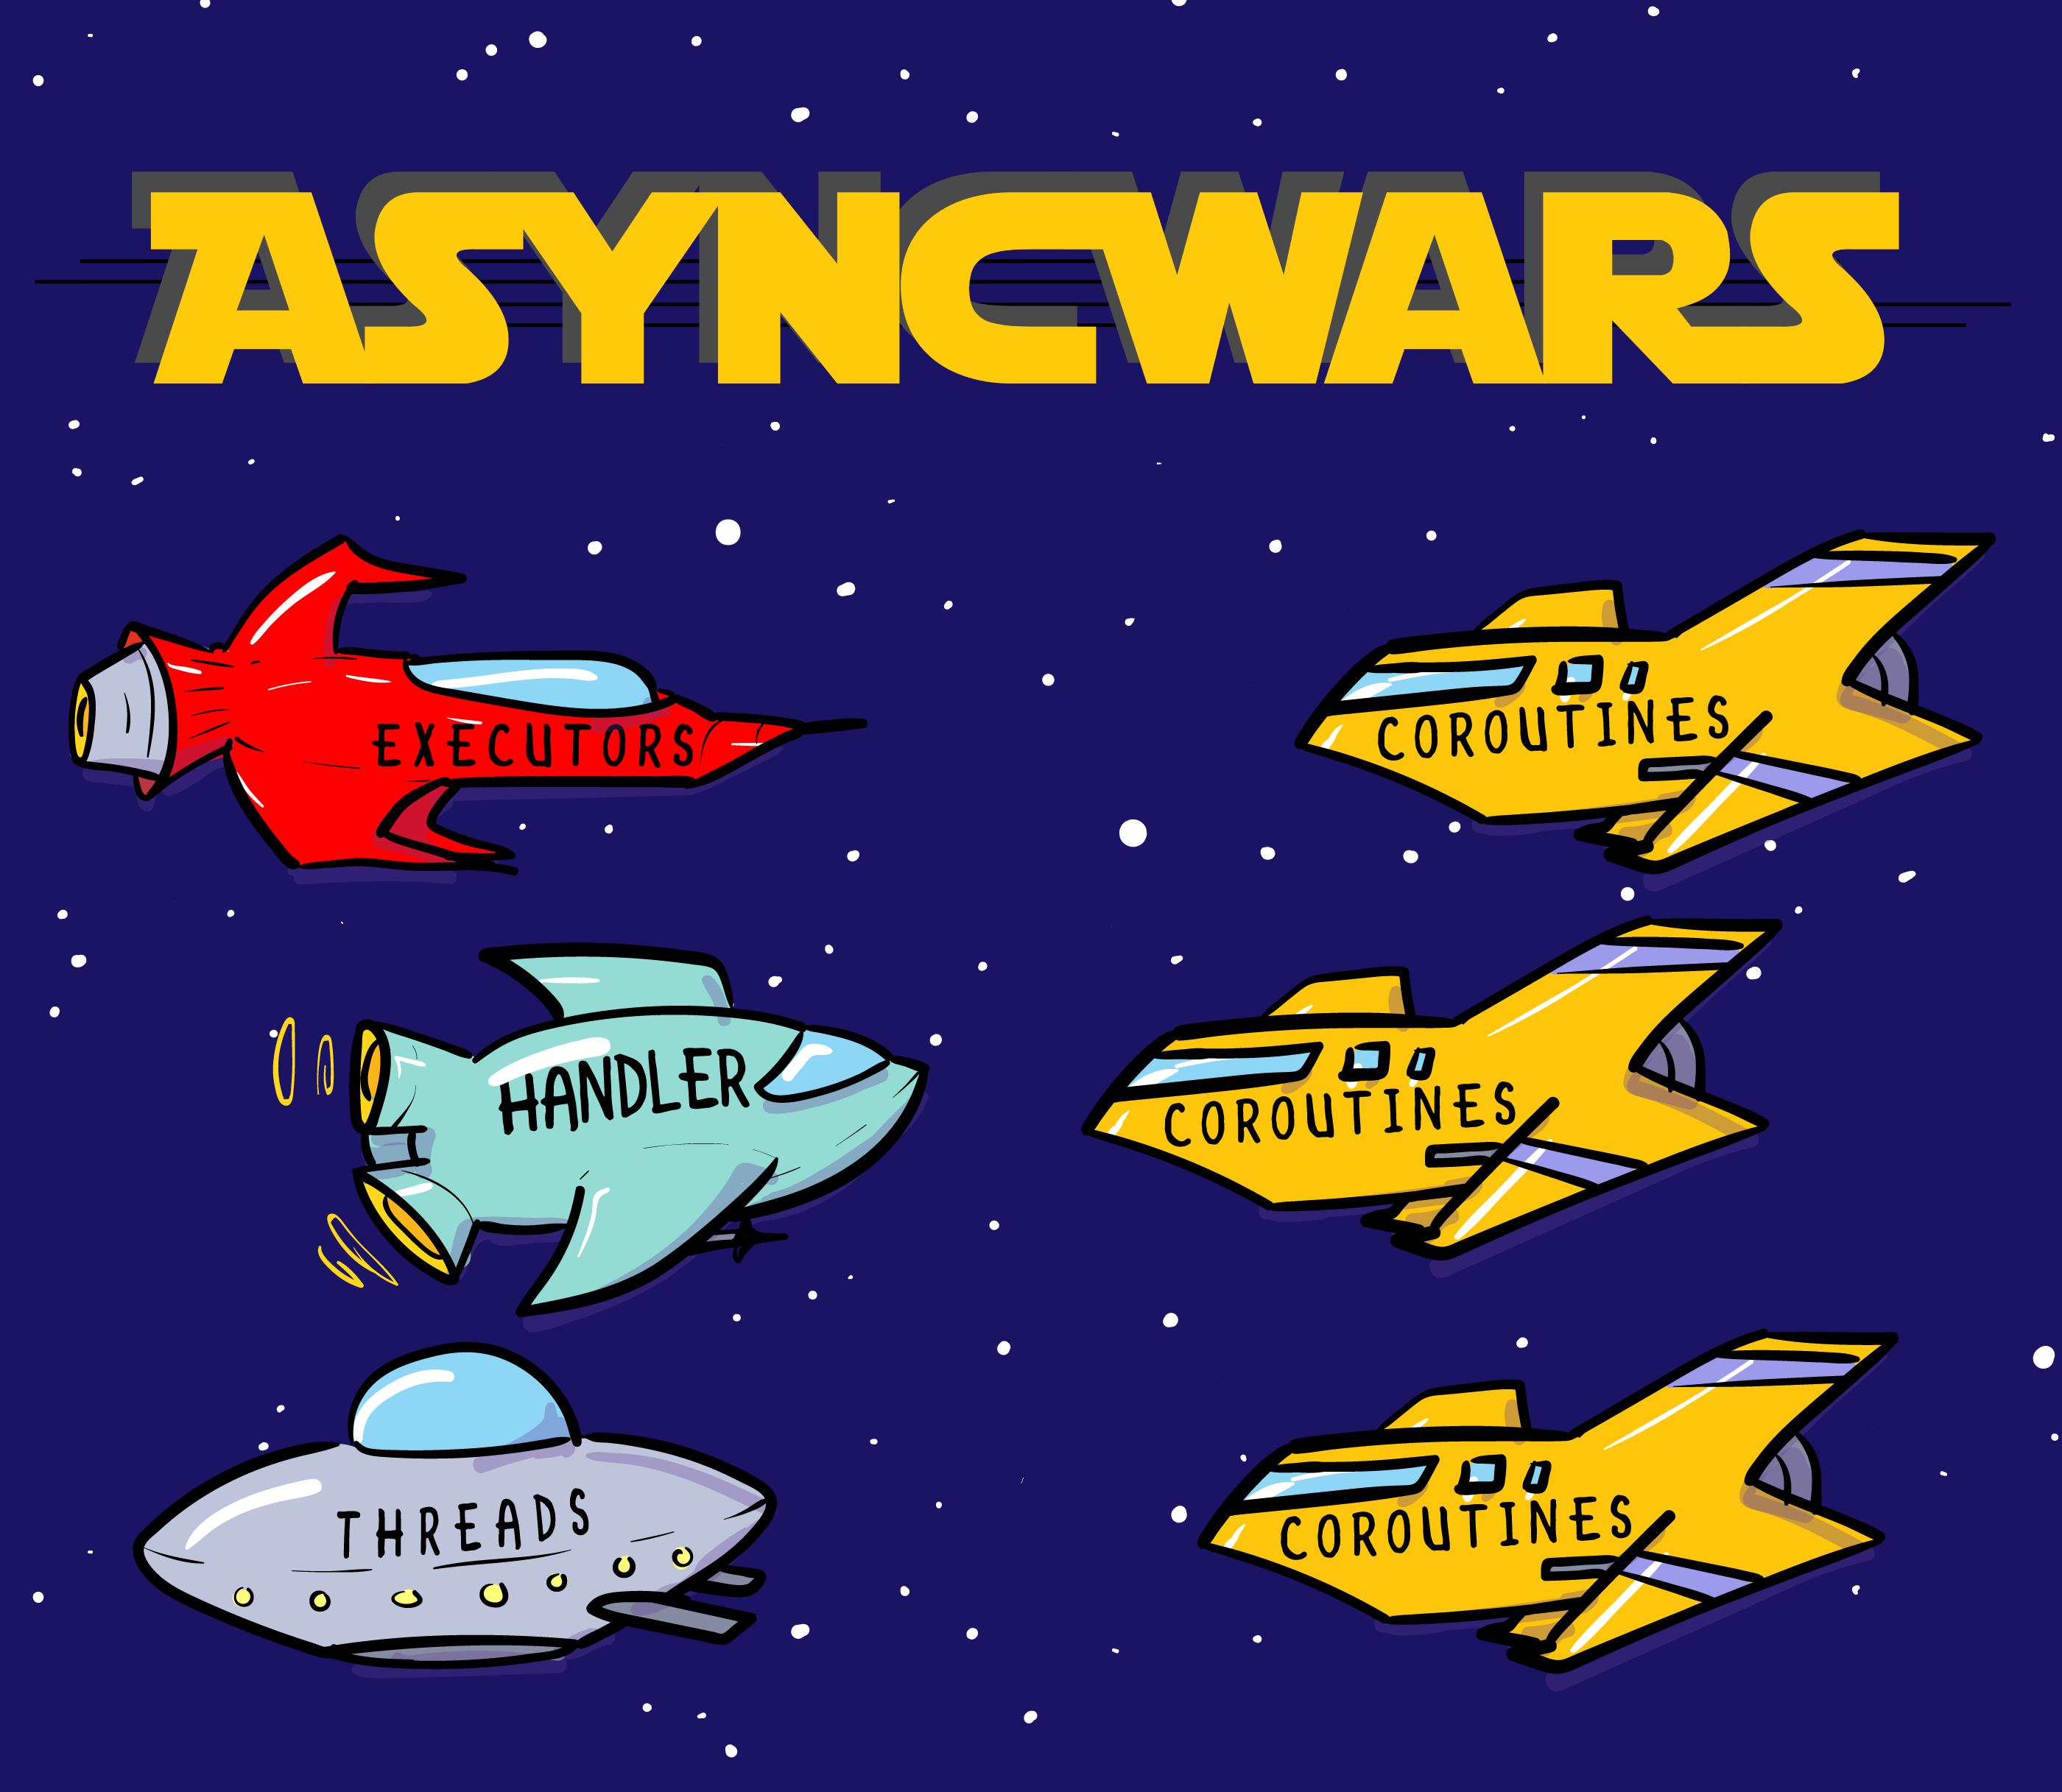 Async Wars